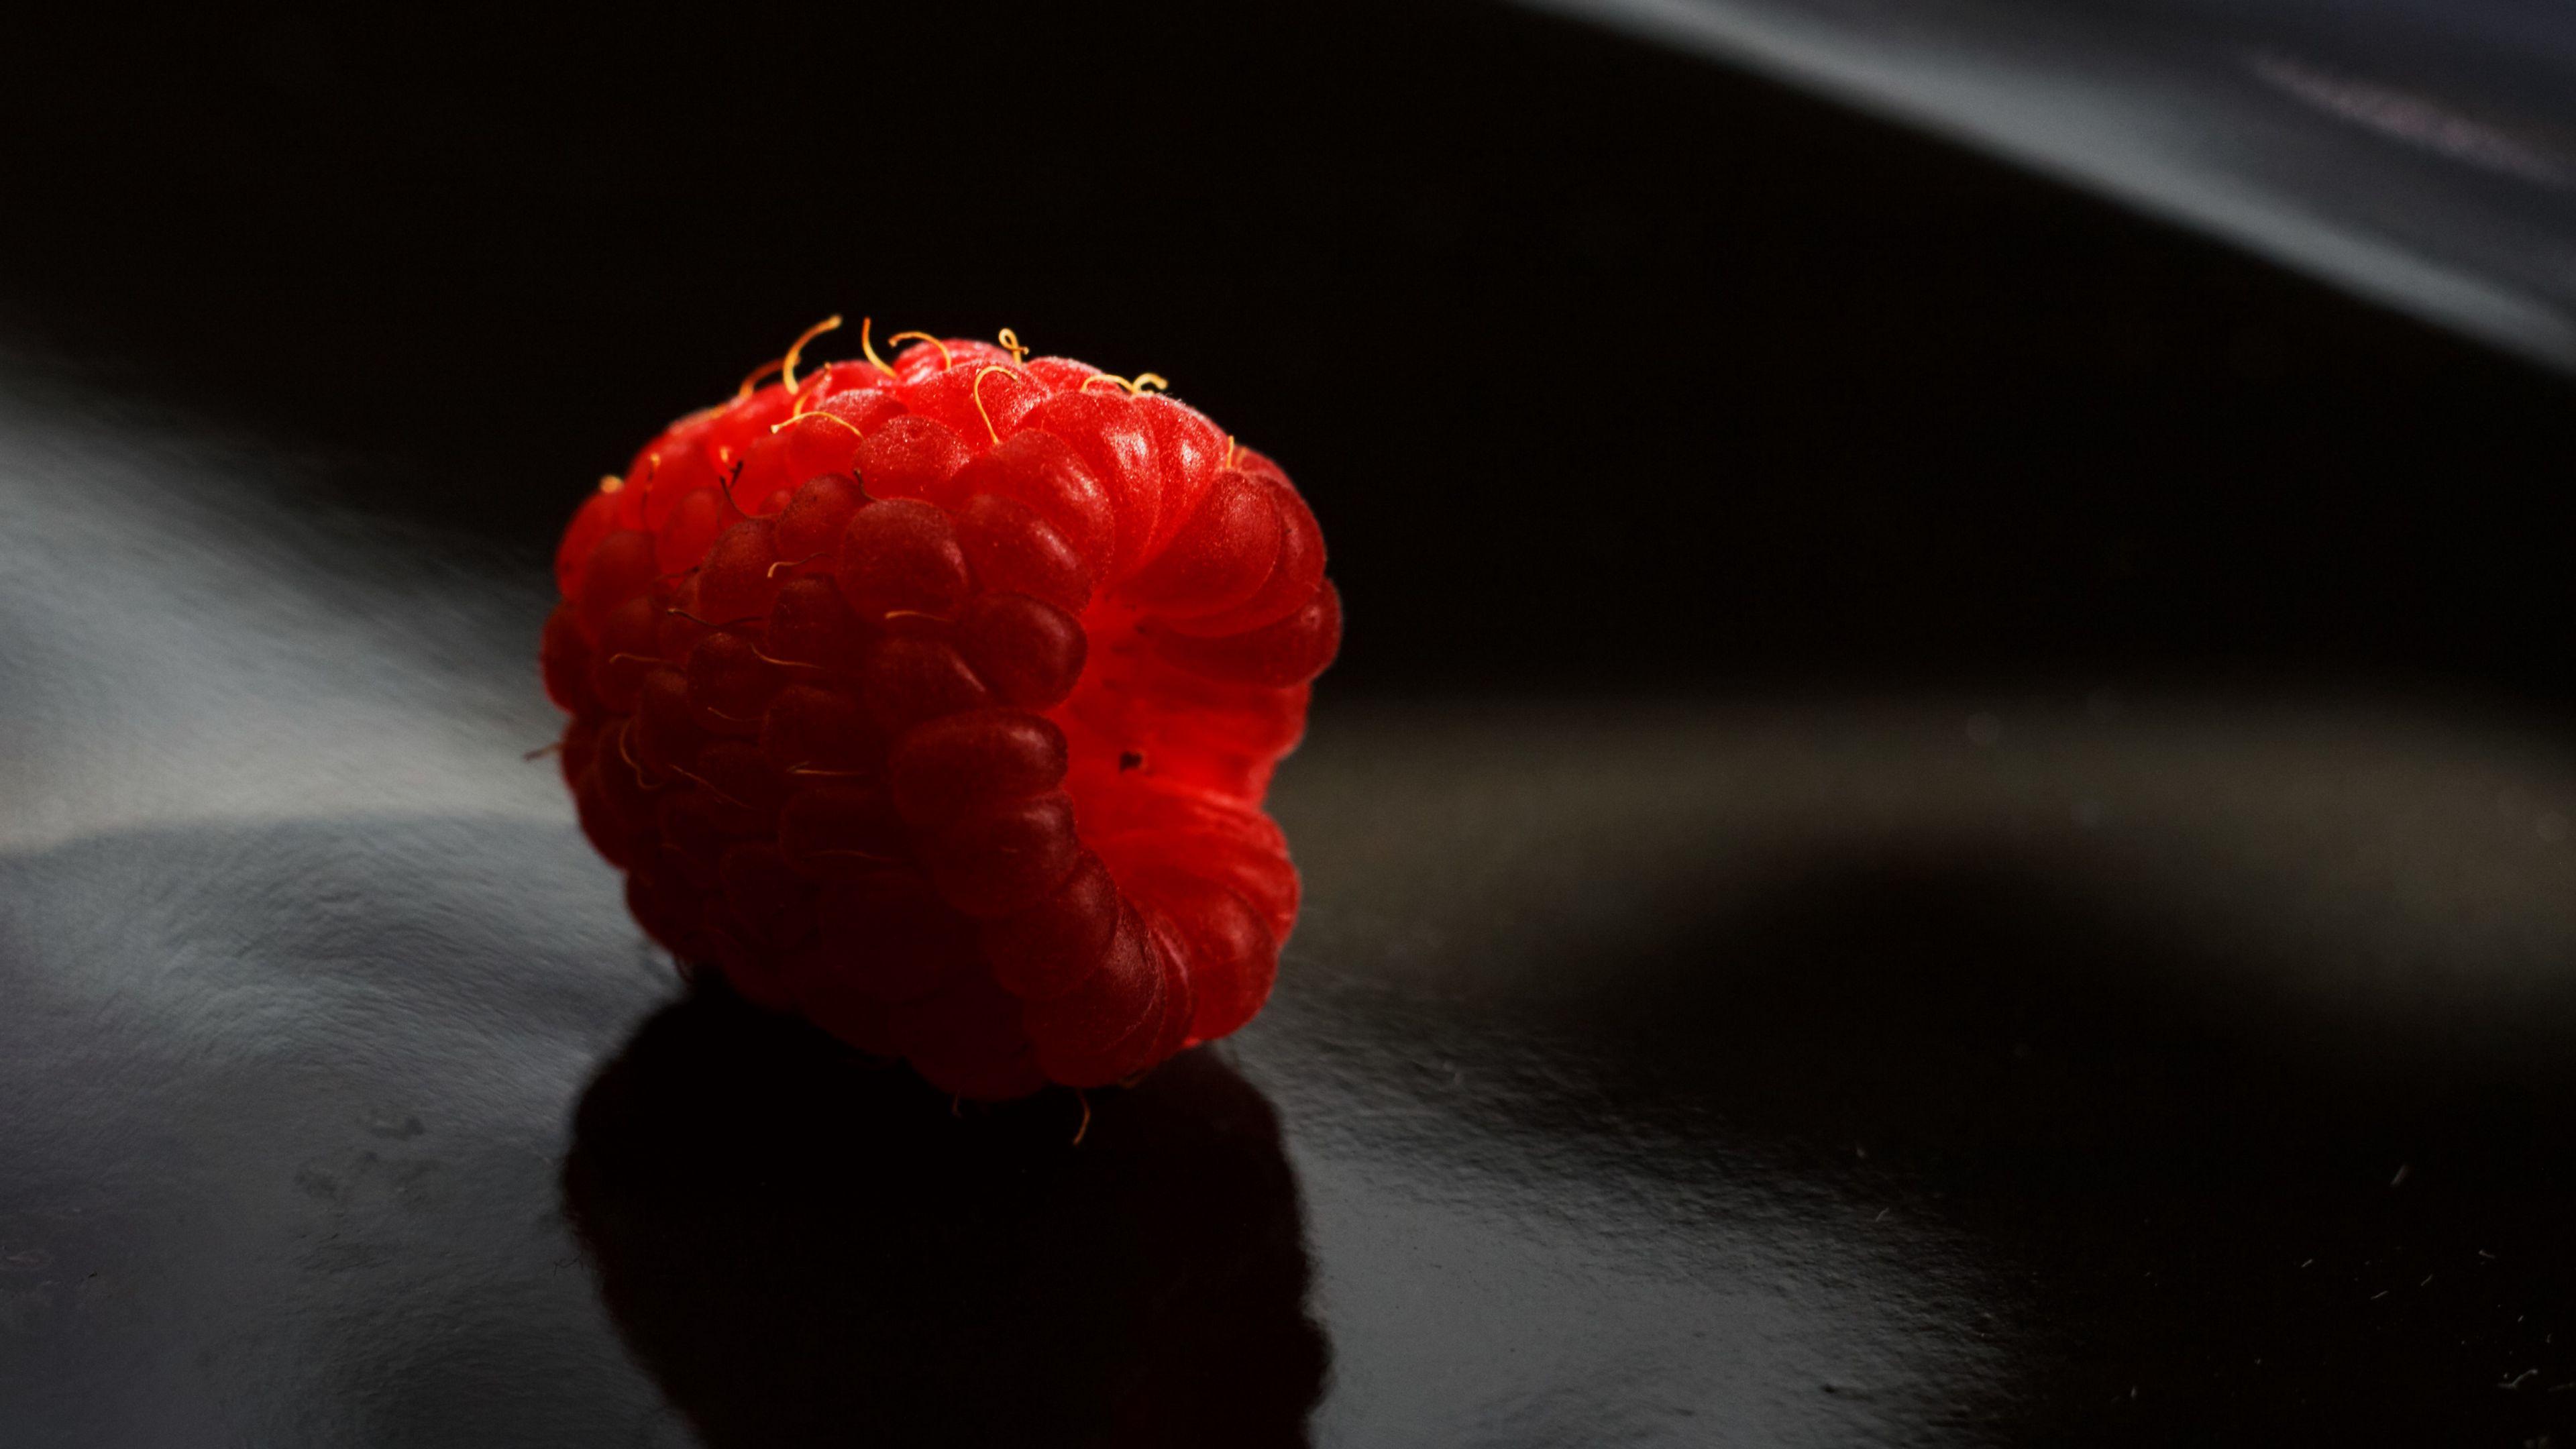 3840x2160 Wallpaper raspberry, berry, ripe, macro, shadow